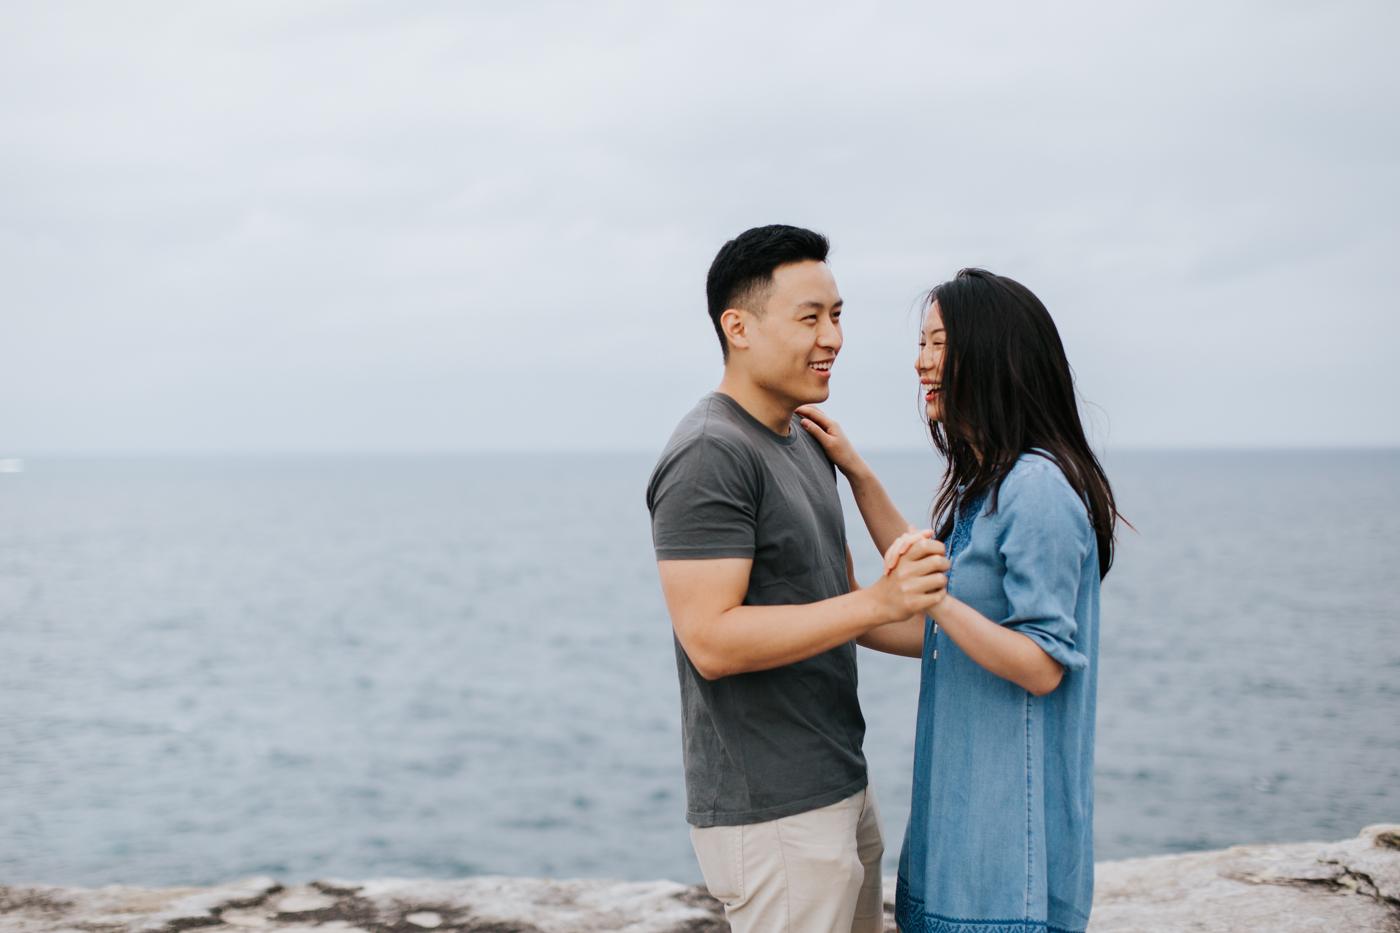 Lishien & Jason Engagement - Kurnell Cliffs - Samantha Heather Photography-18.jpg